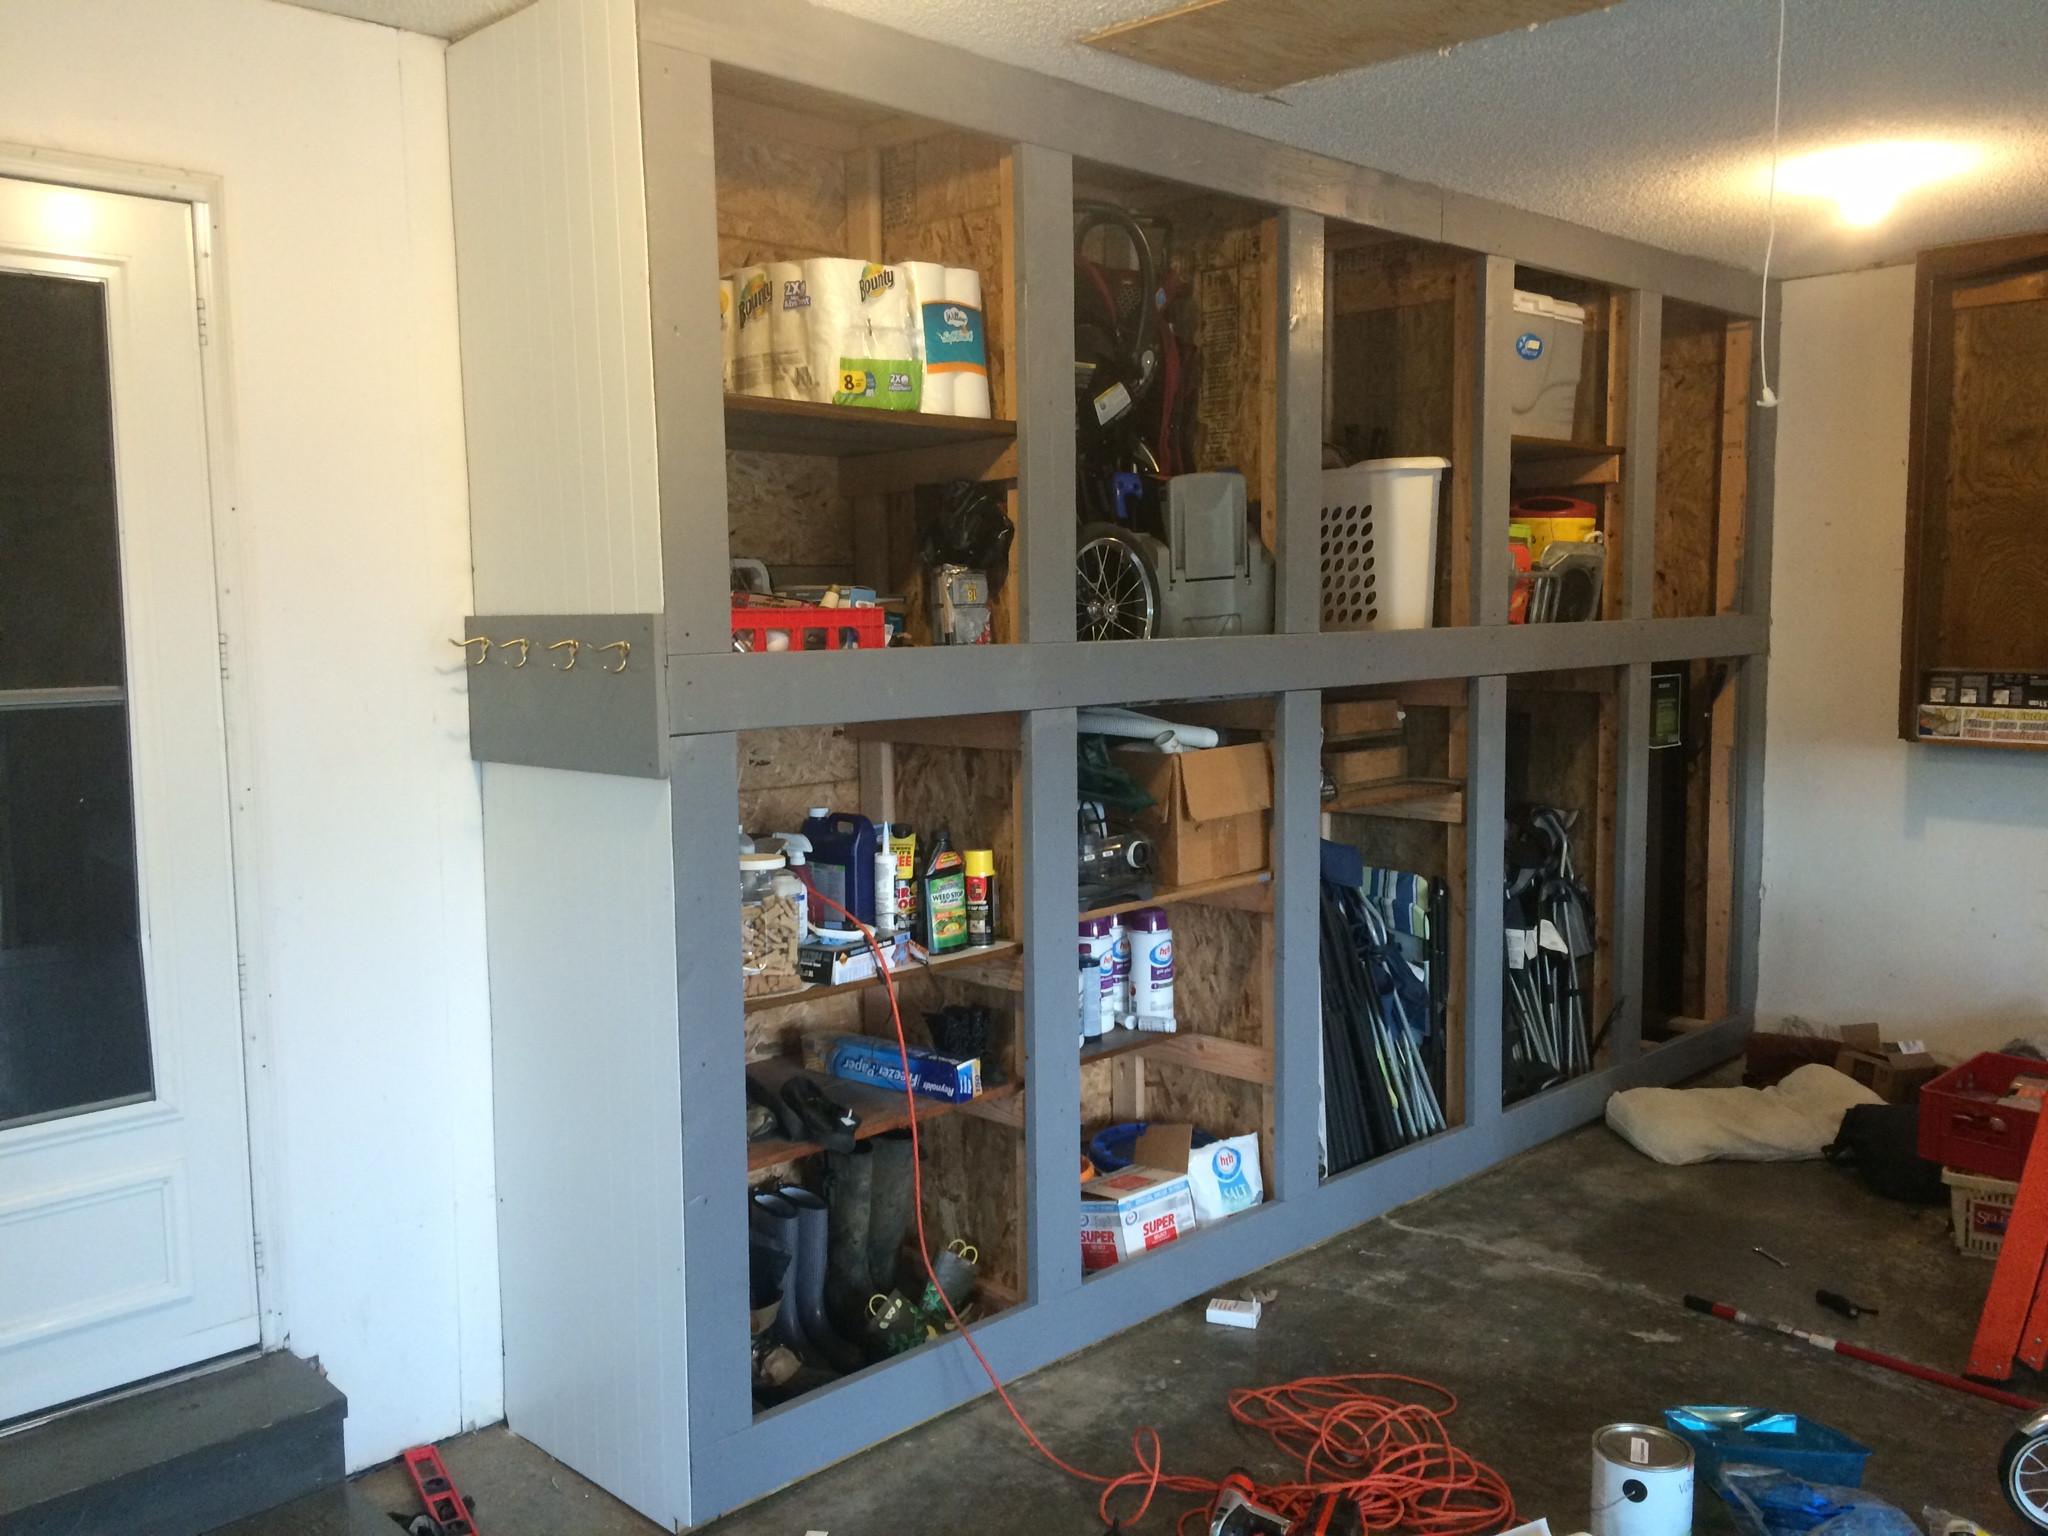 Best ideas about DIY Garage Storage Cabinet . Save or Pin How to Plan & Build DIY Garage Storage Cabinets Now.